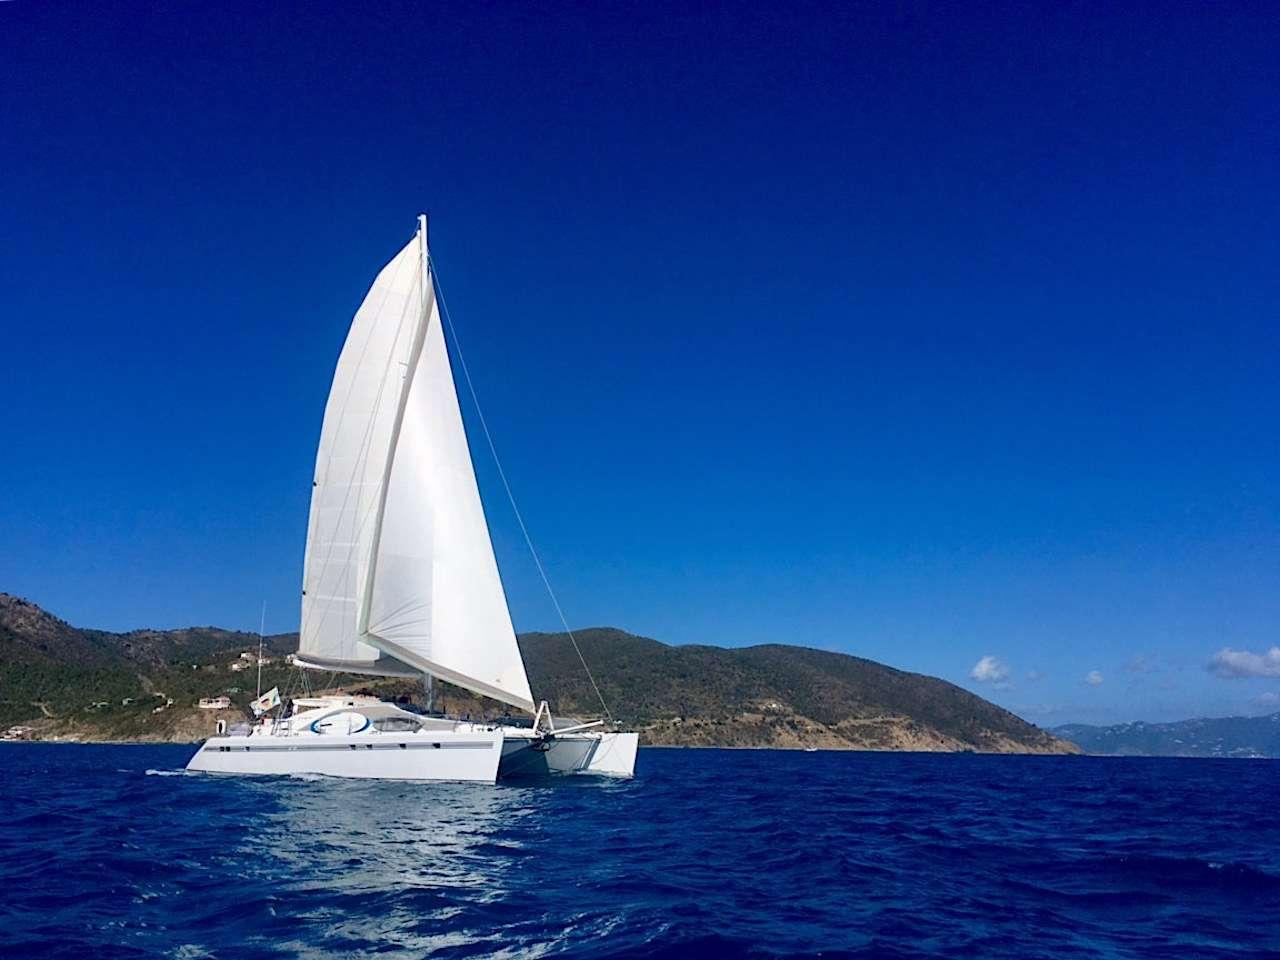 Main image of KELEA yacht